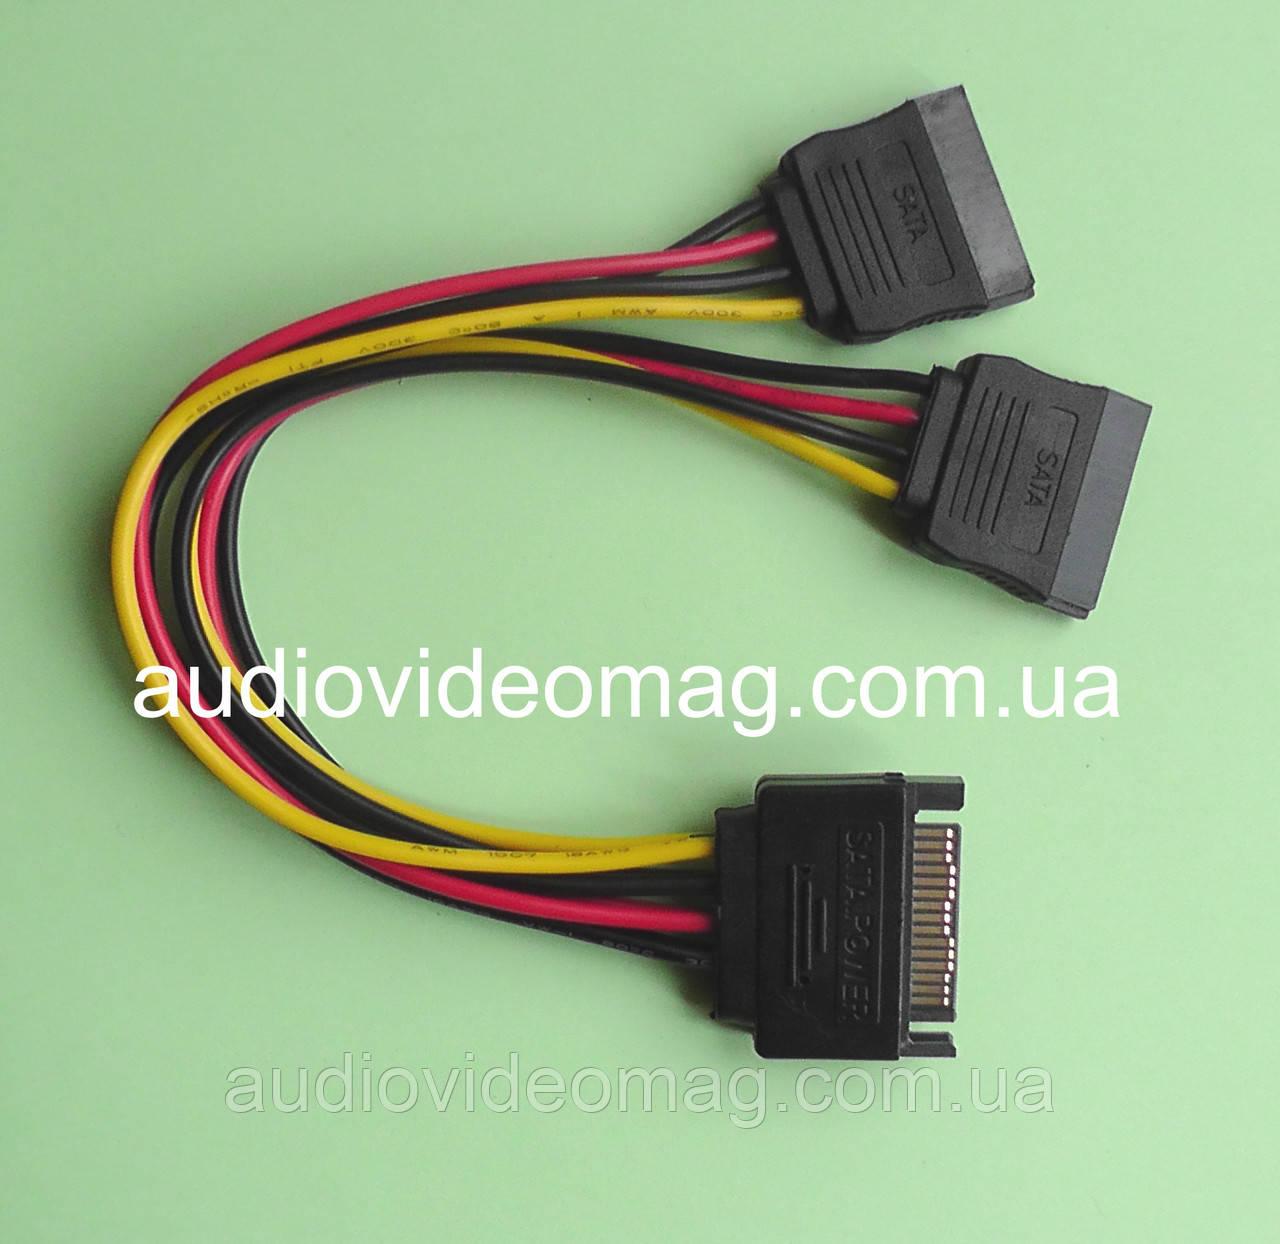 Кабель-разветвитель штекер SATA 15 pin на 2 гнезда SATA 15 рin